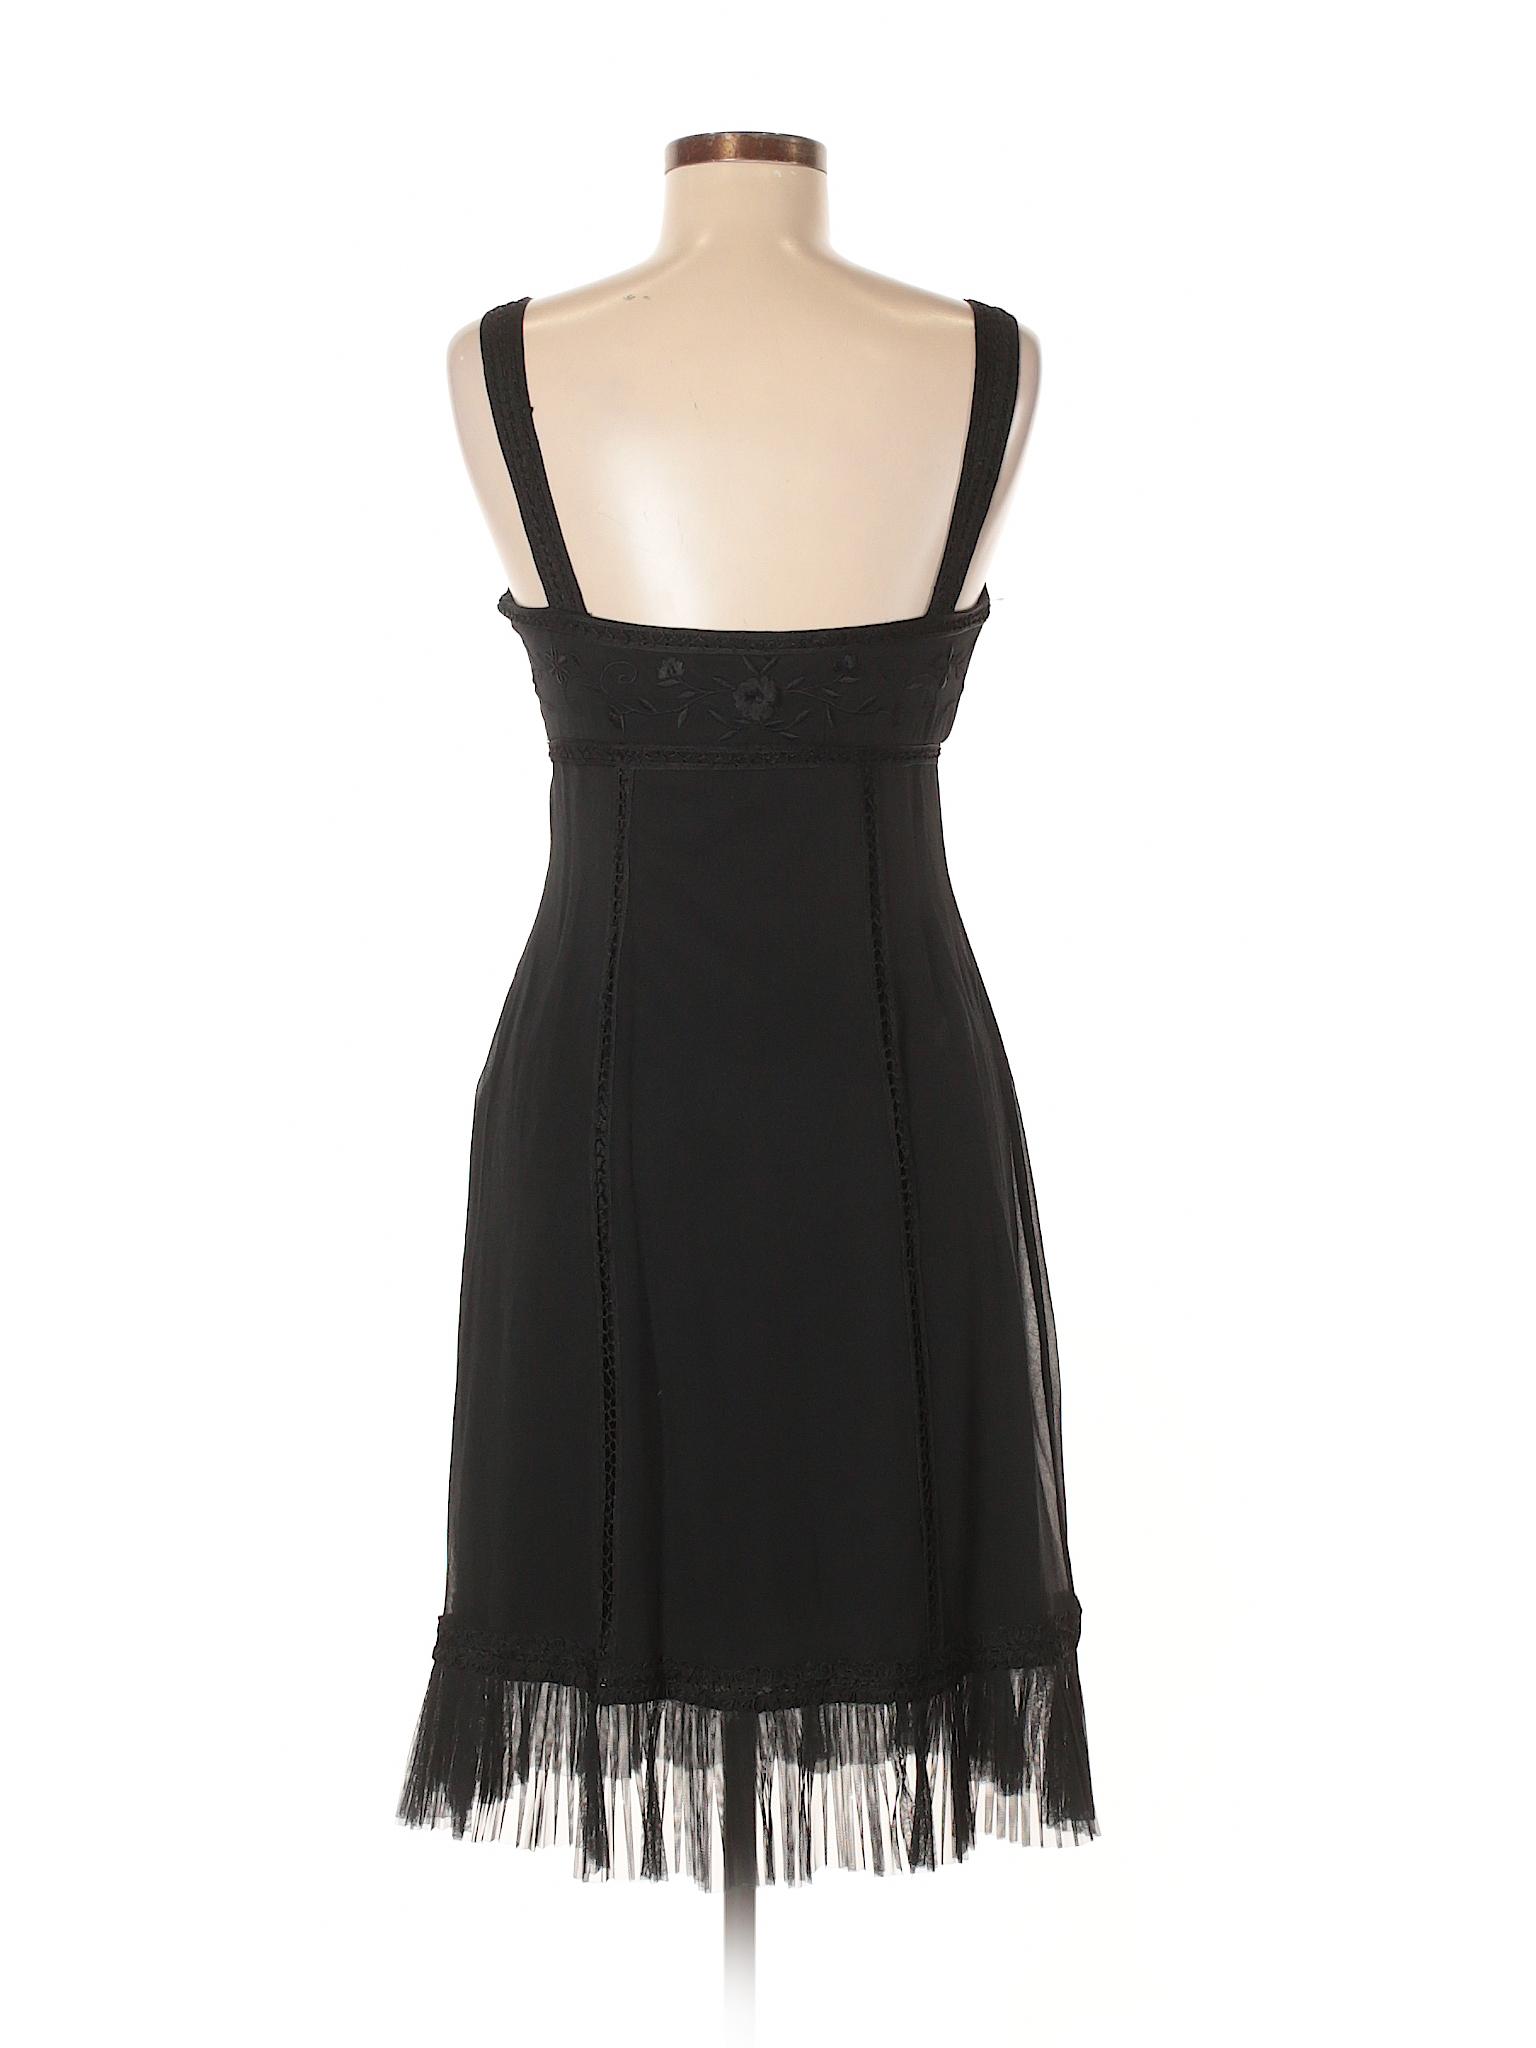 Casual Boutique Wong Dress winter Sue qwvXcRx4f